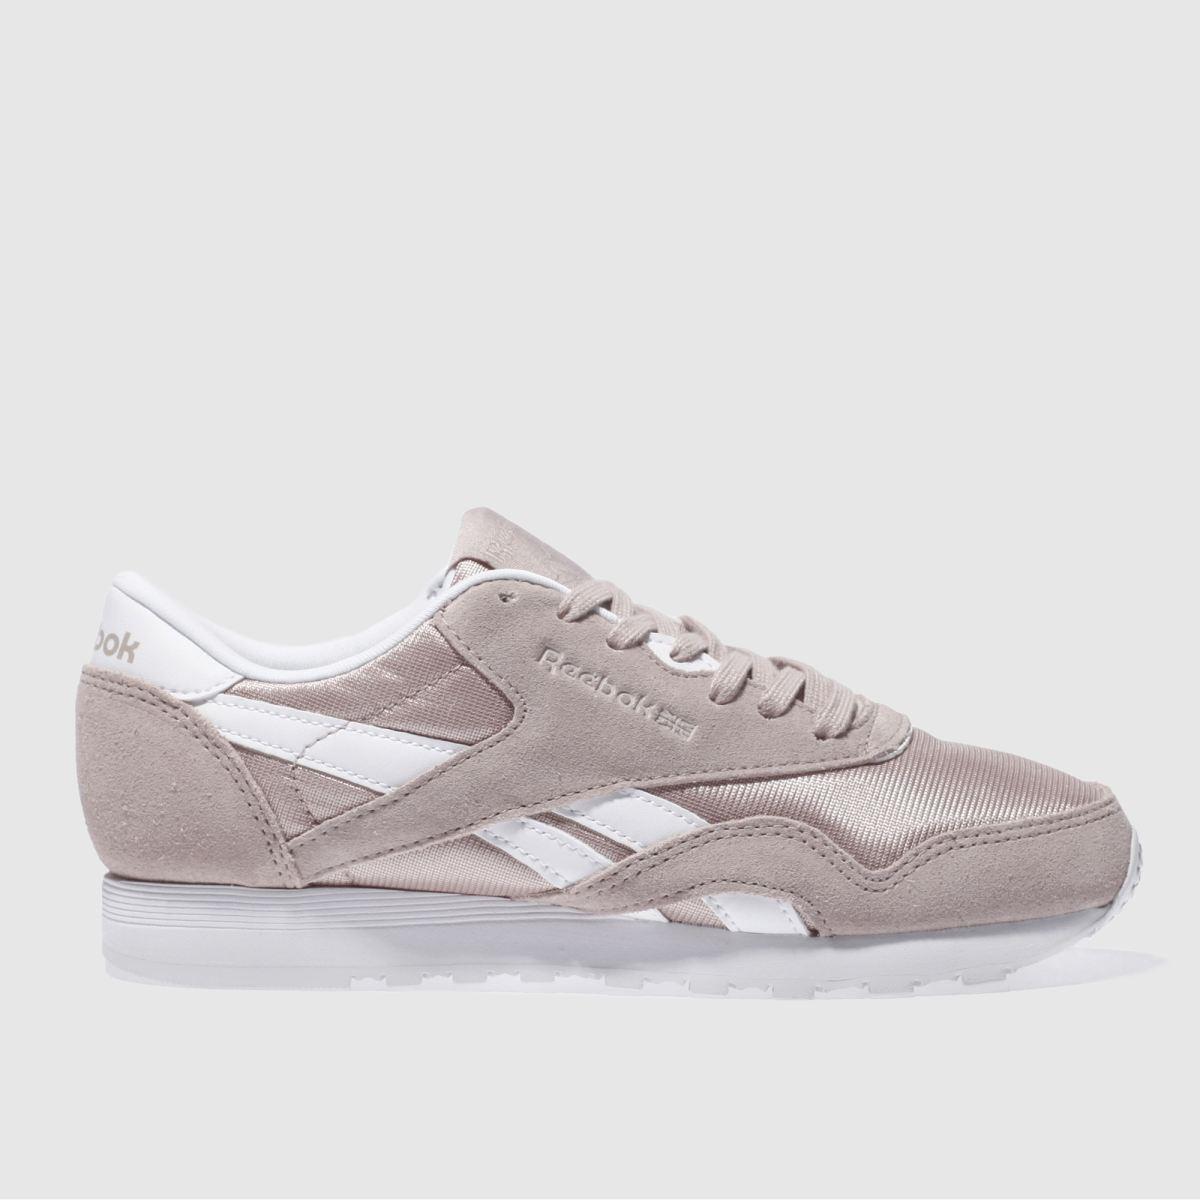 Reebok Reebok Pale Pink Classic Suede & Nylon Trainers